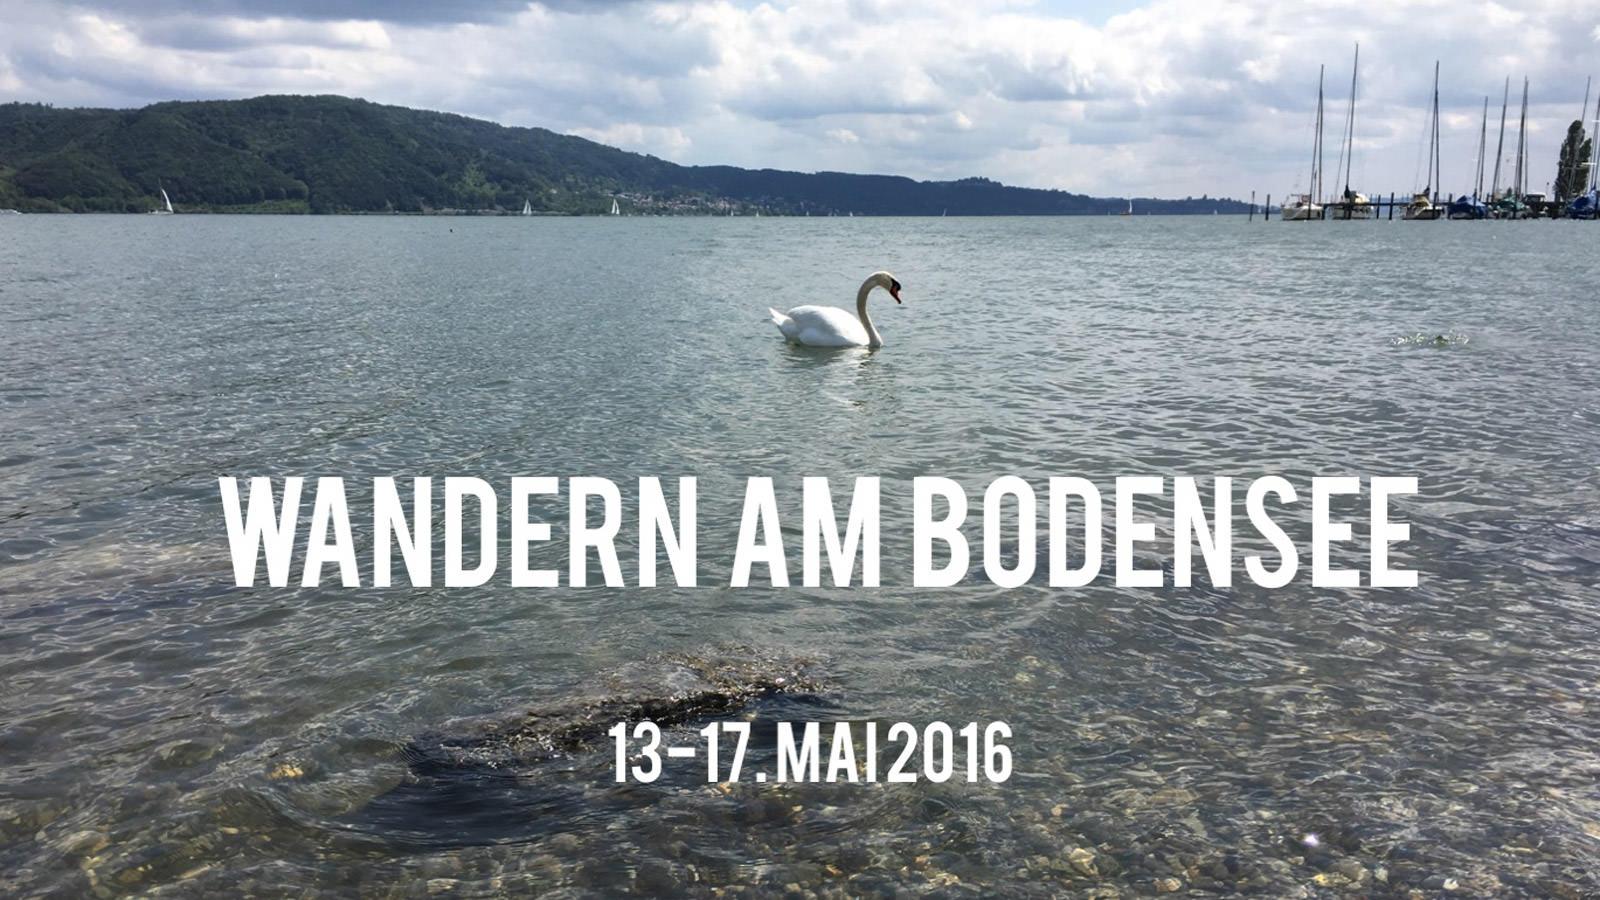 Wandern am Bodensee 2016